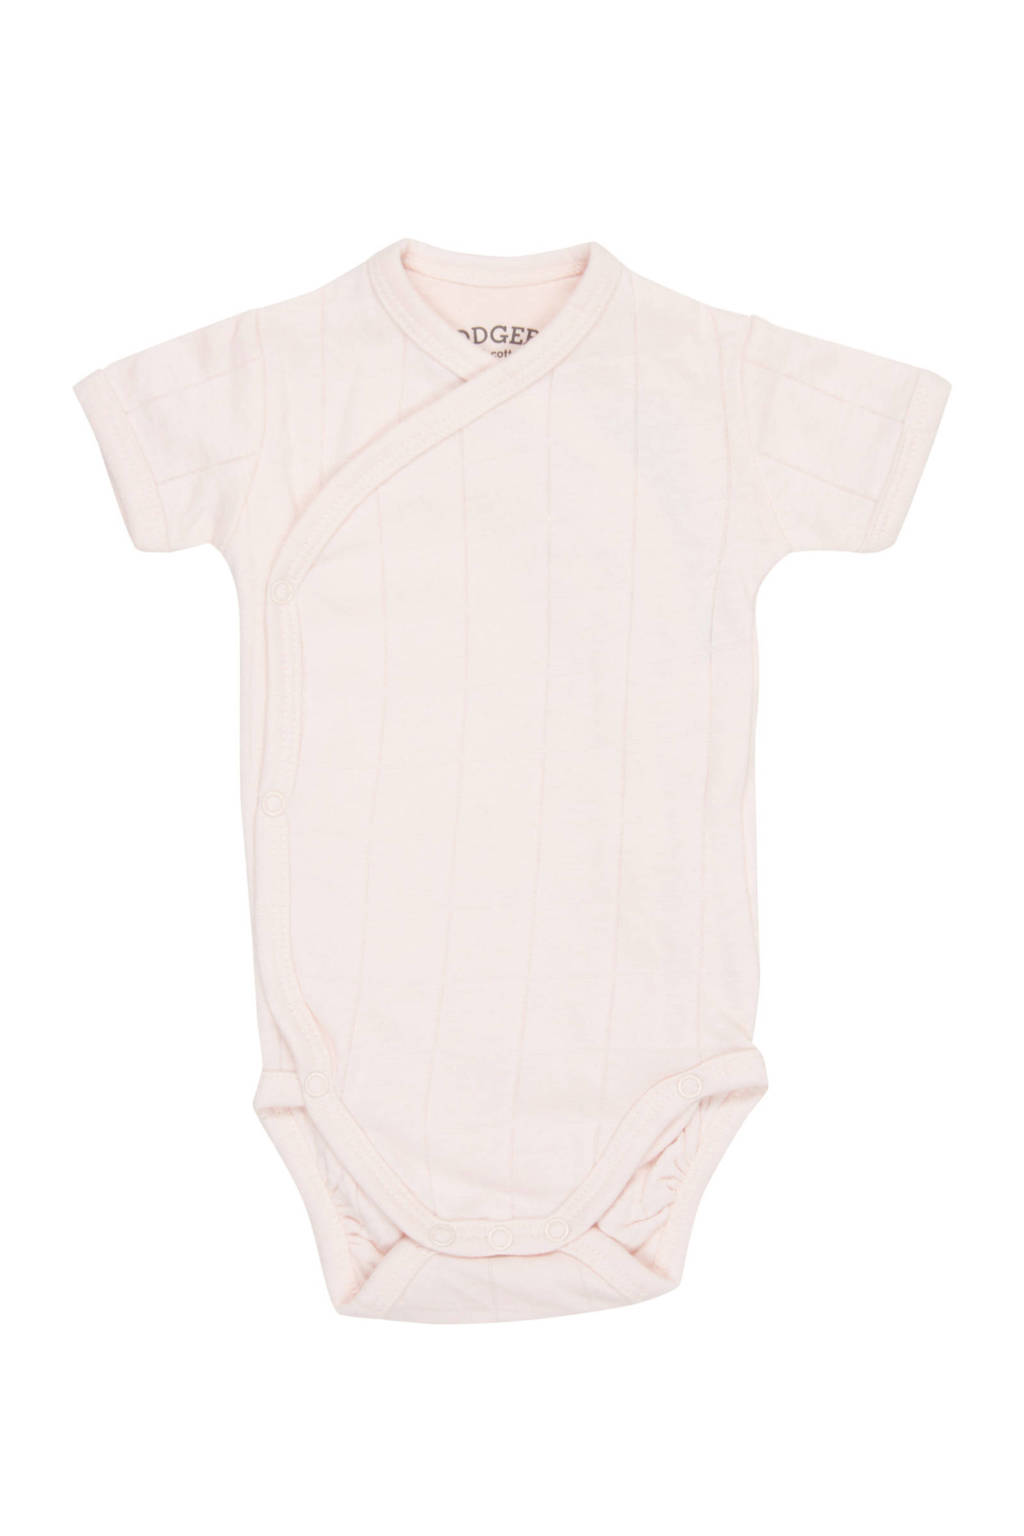 Lodger newborn baby romper Solid, Lichtroze